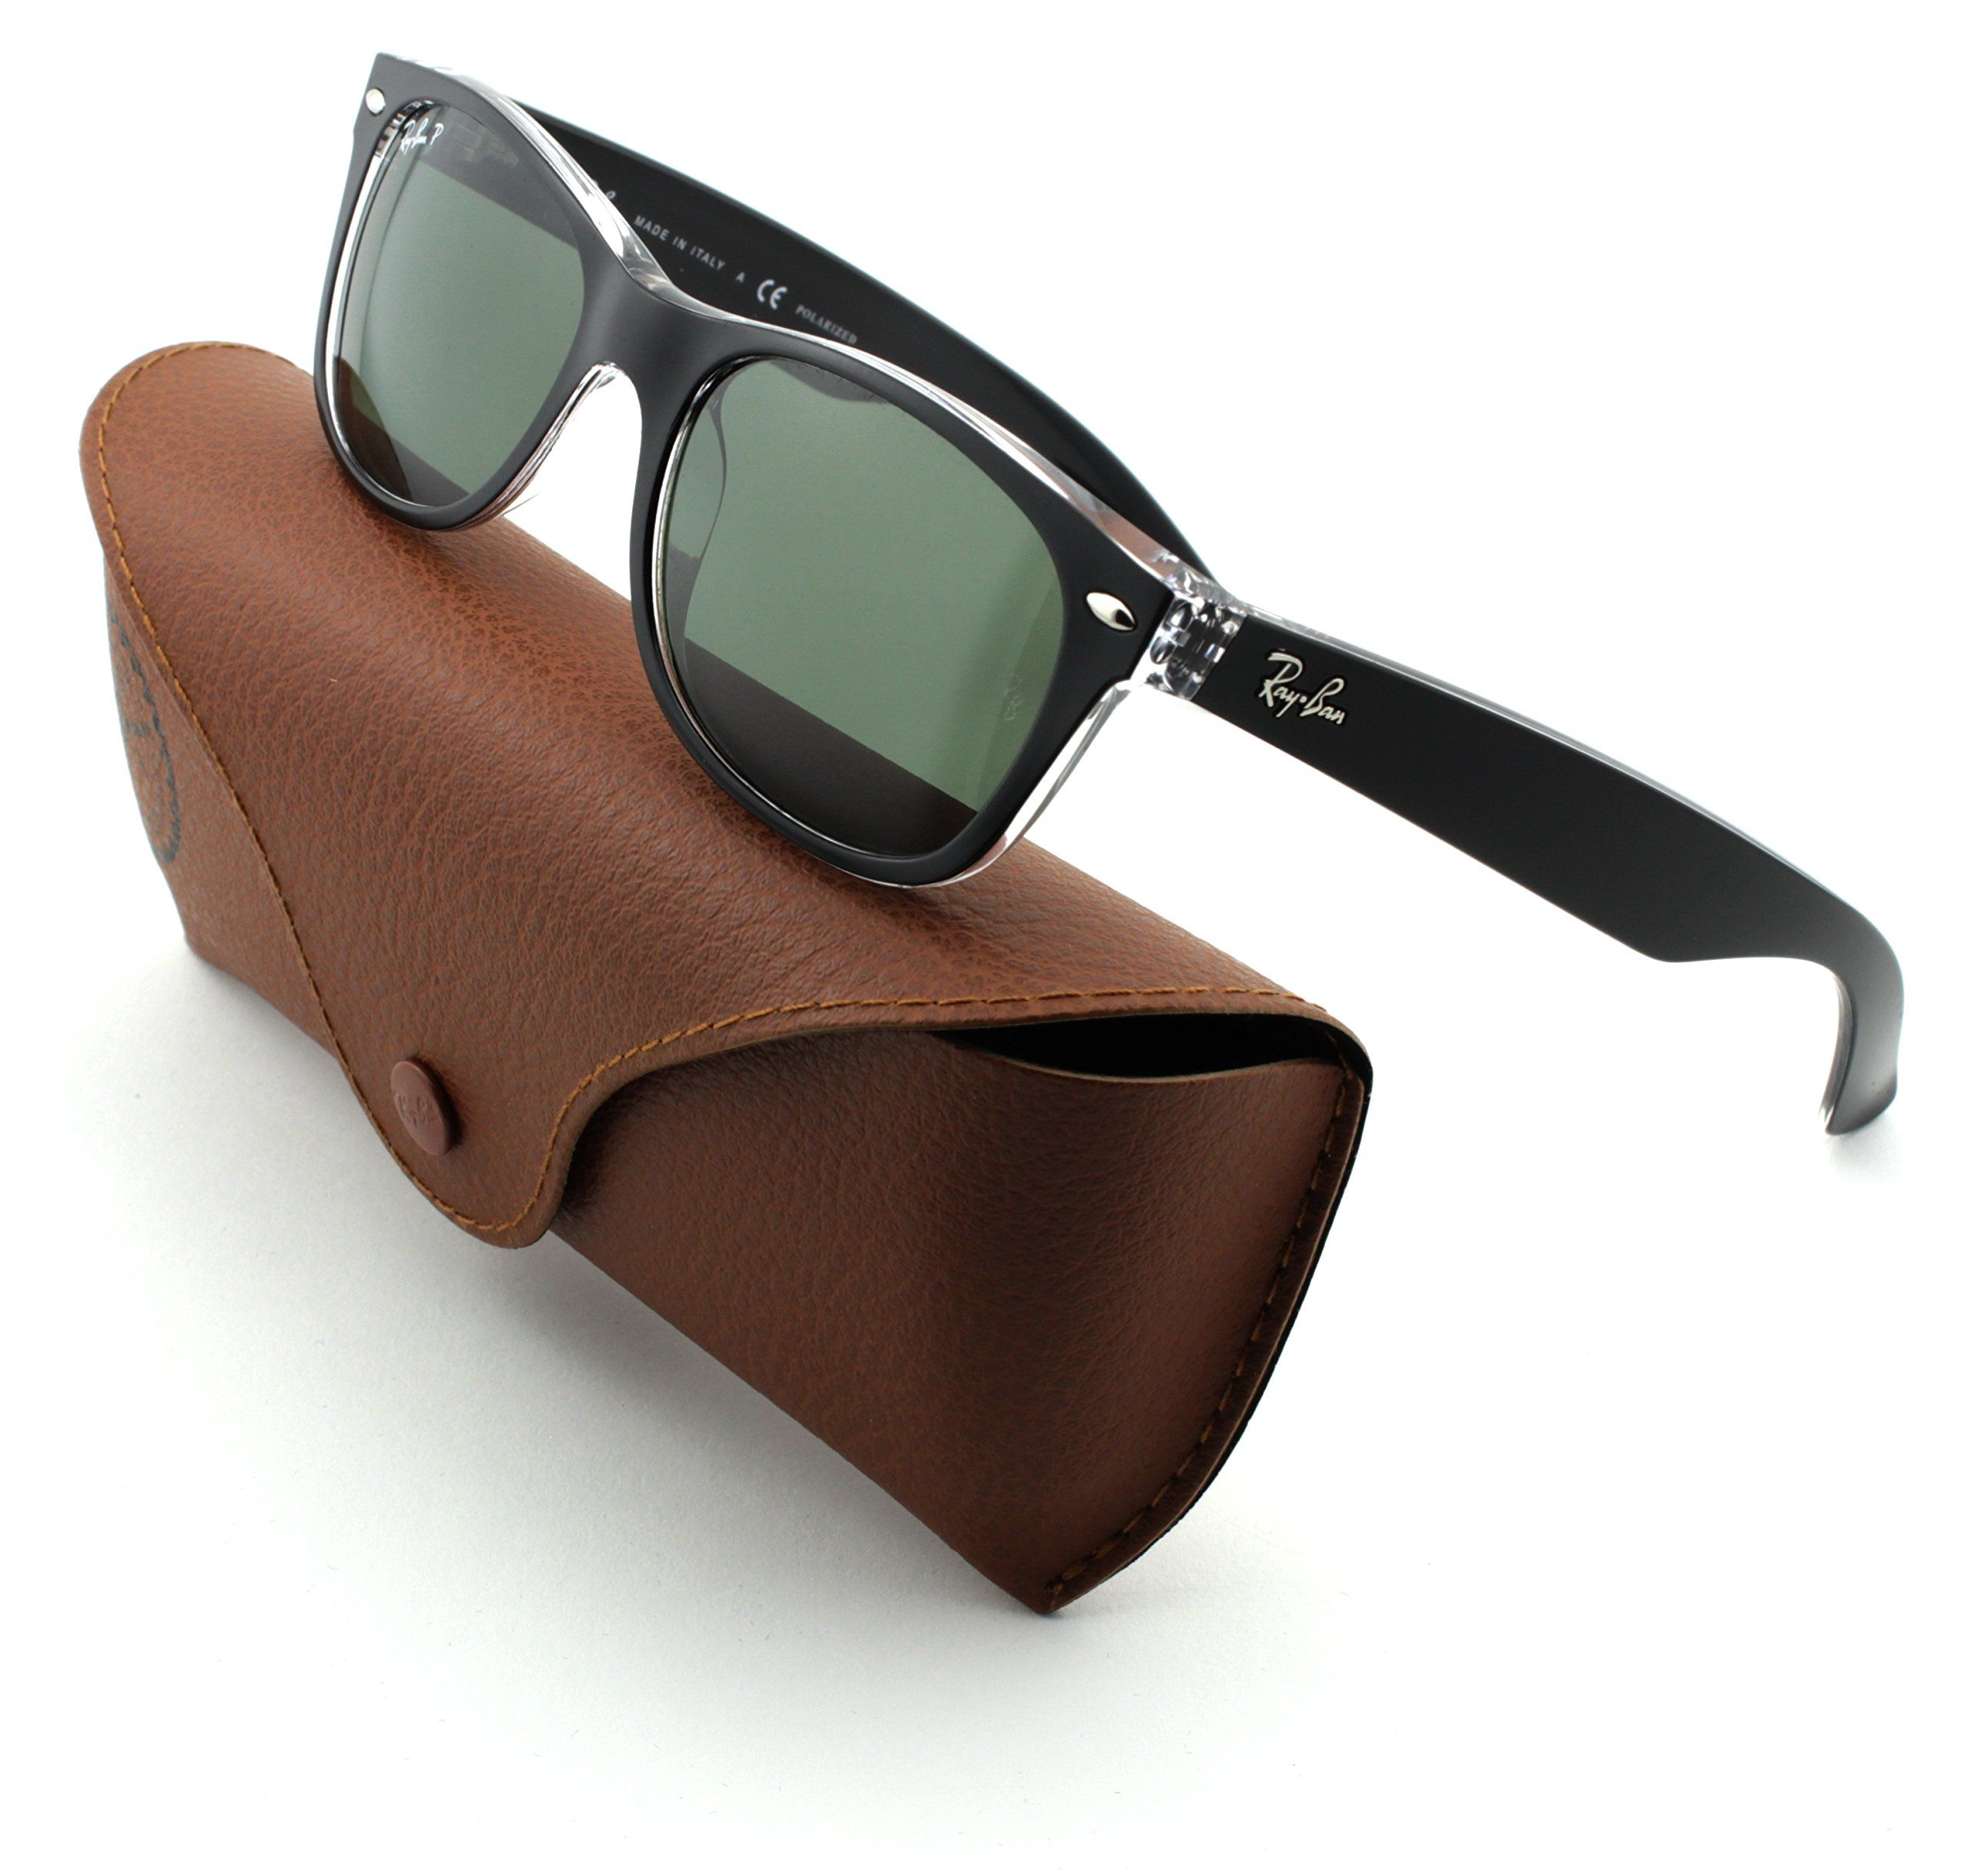 5024a51921 Ray-Ban RB2132 New Wayfarer Unisex Sunglasses (Black on Trasparent Frame  Green  Polarized Lens 605258